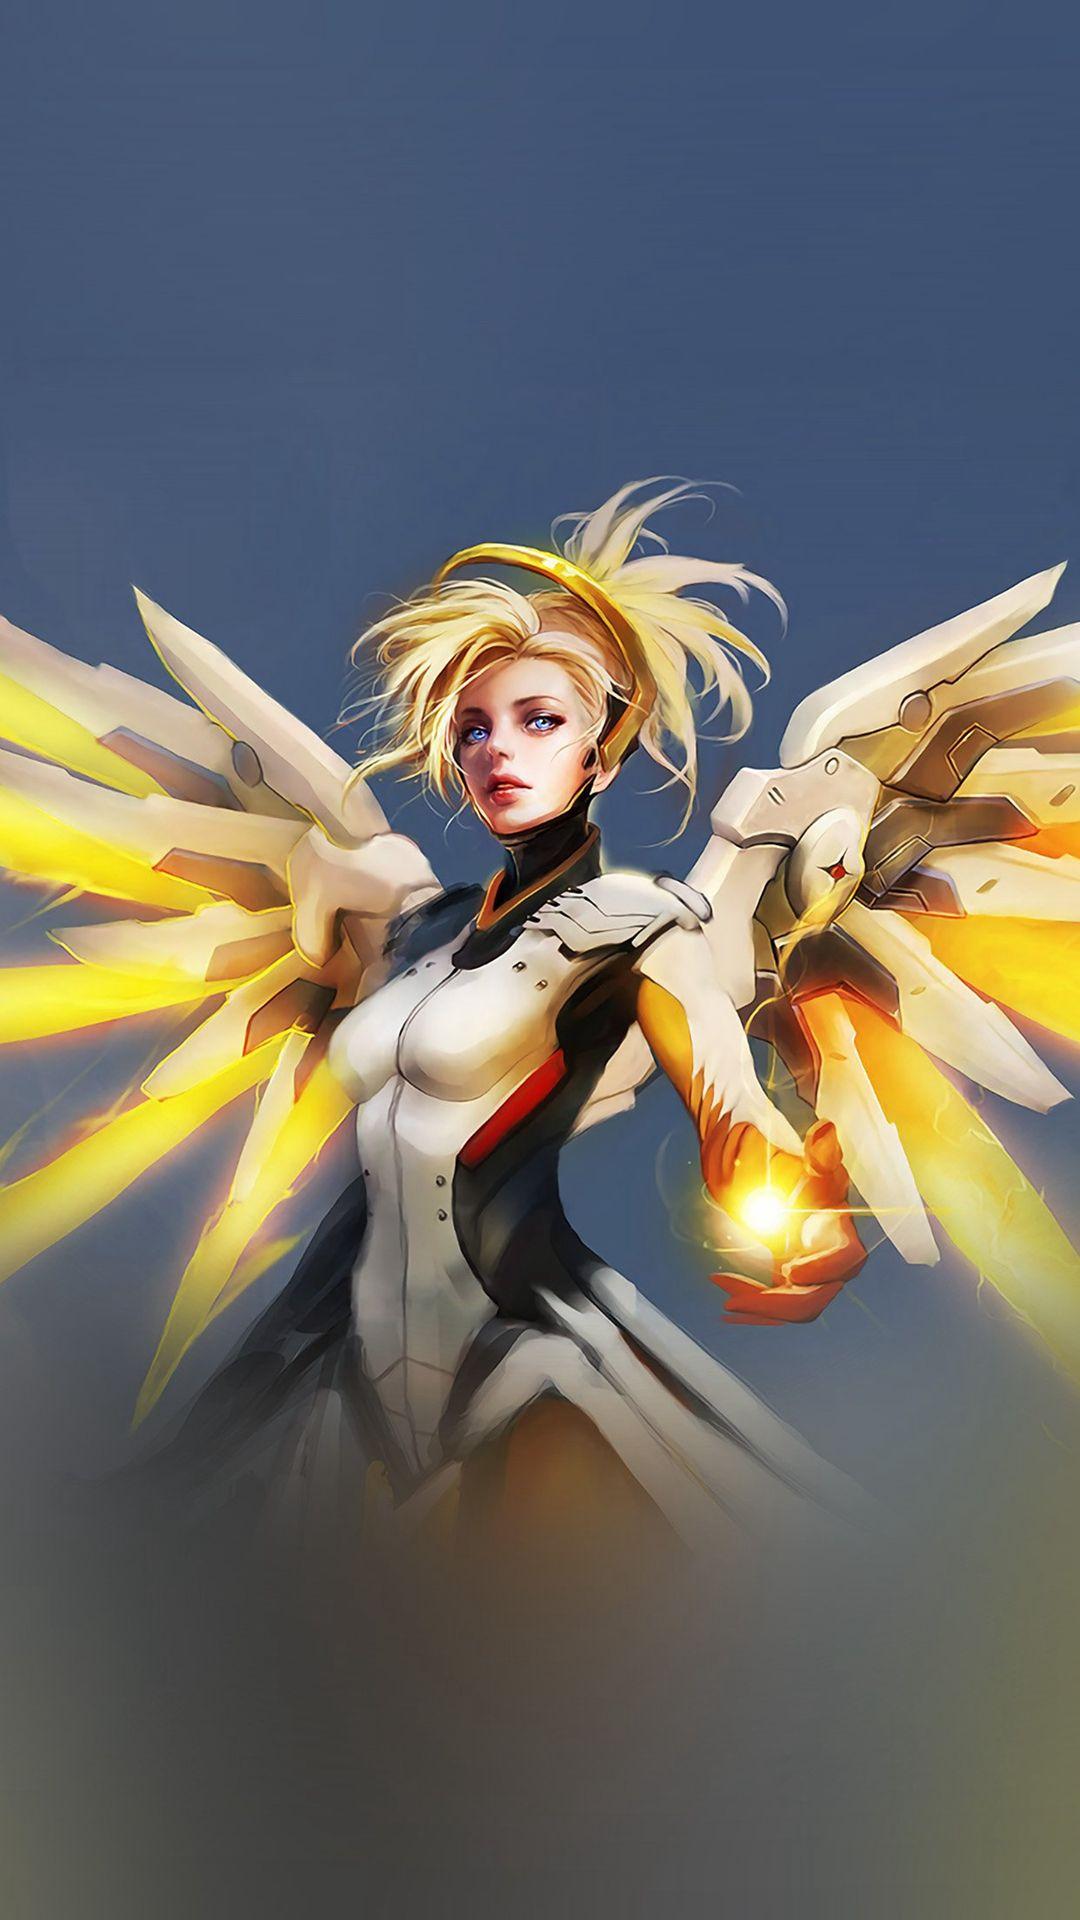 Overwatch Mercy Cute Game Art Illustration Angel iPhone 8